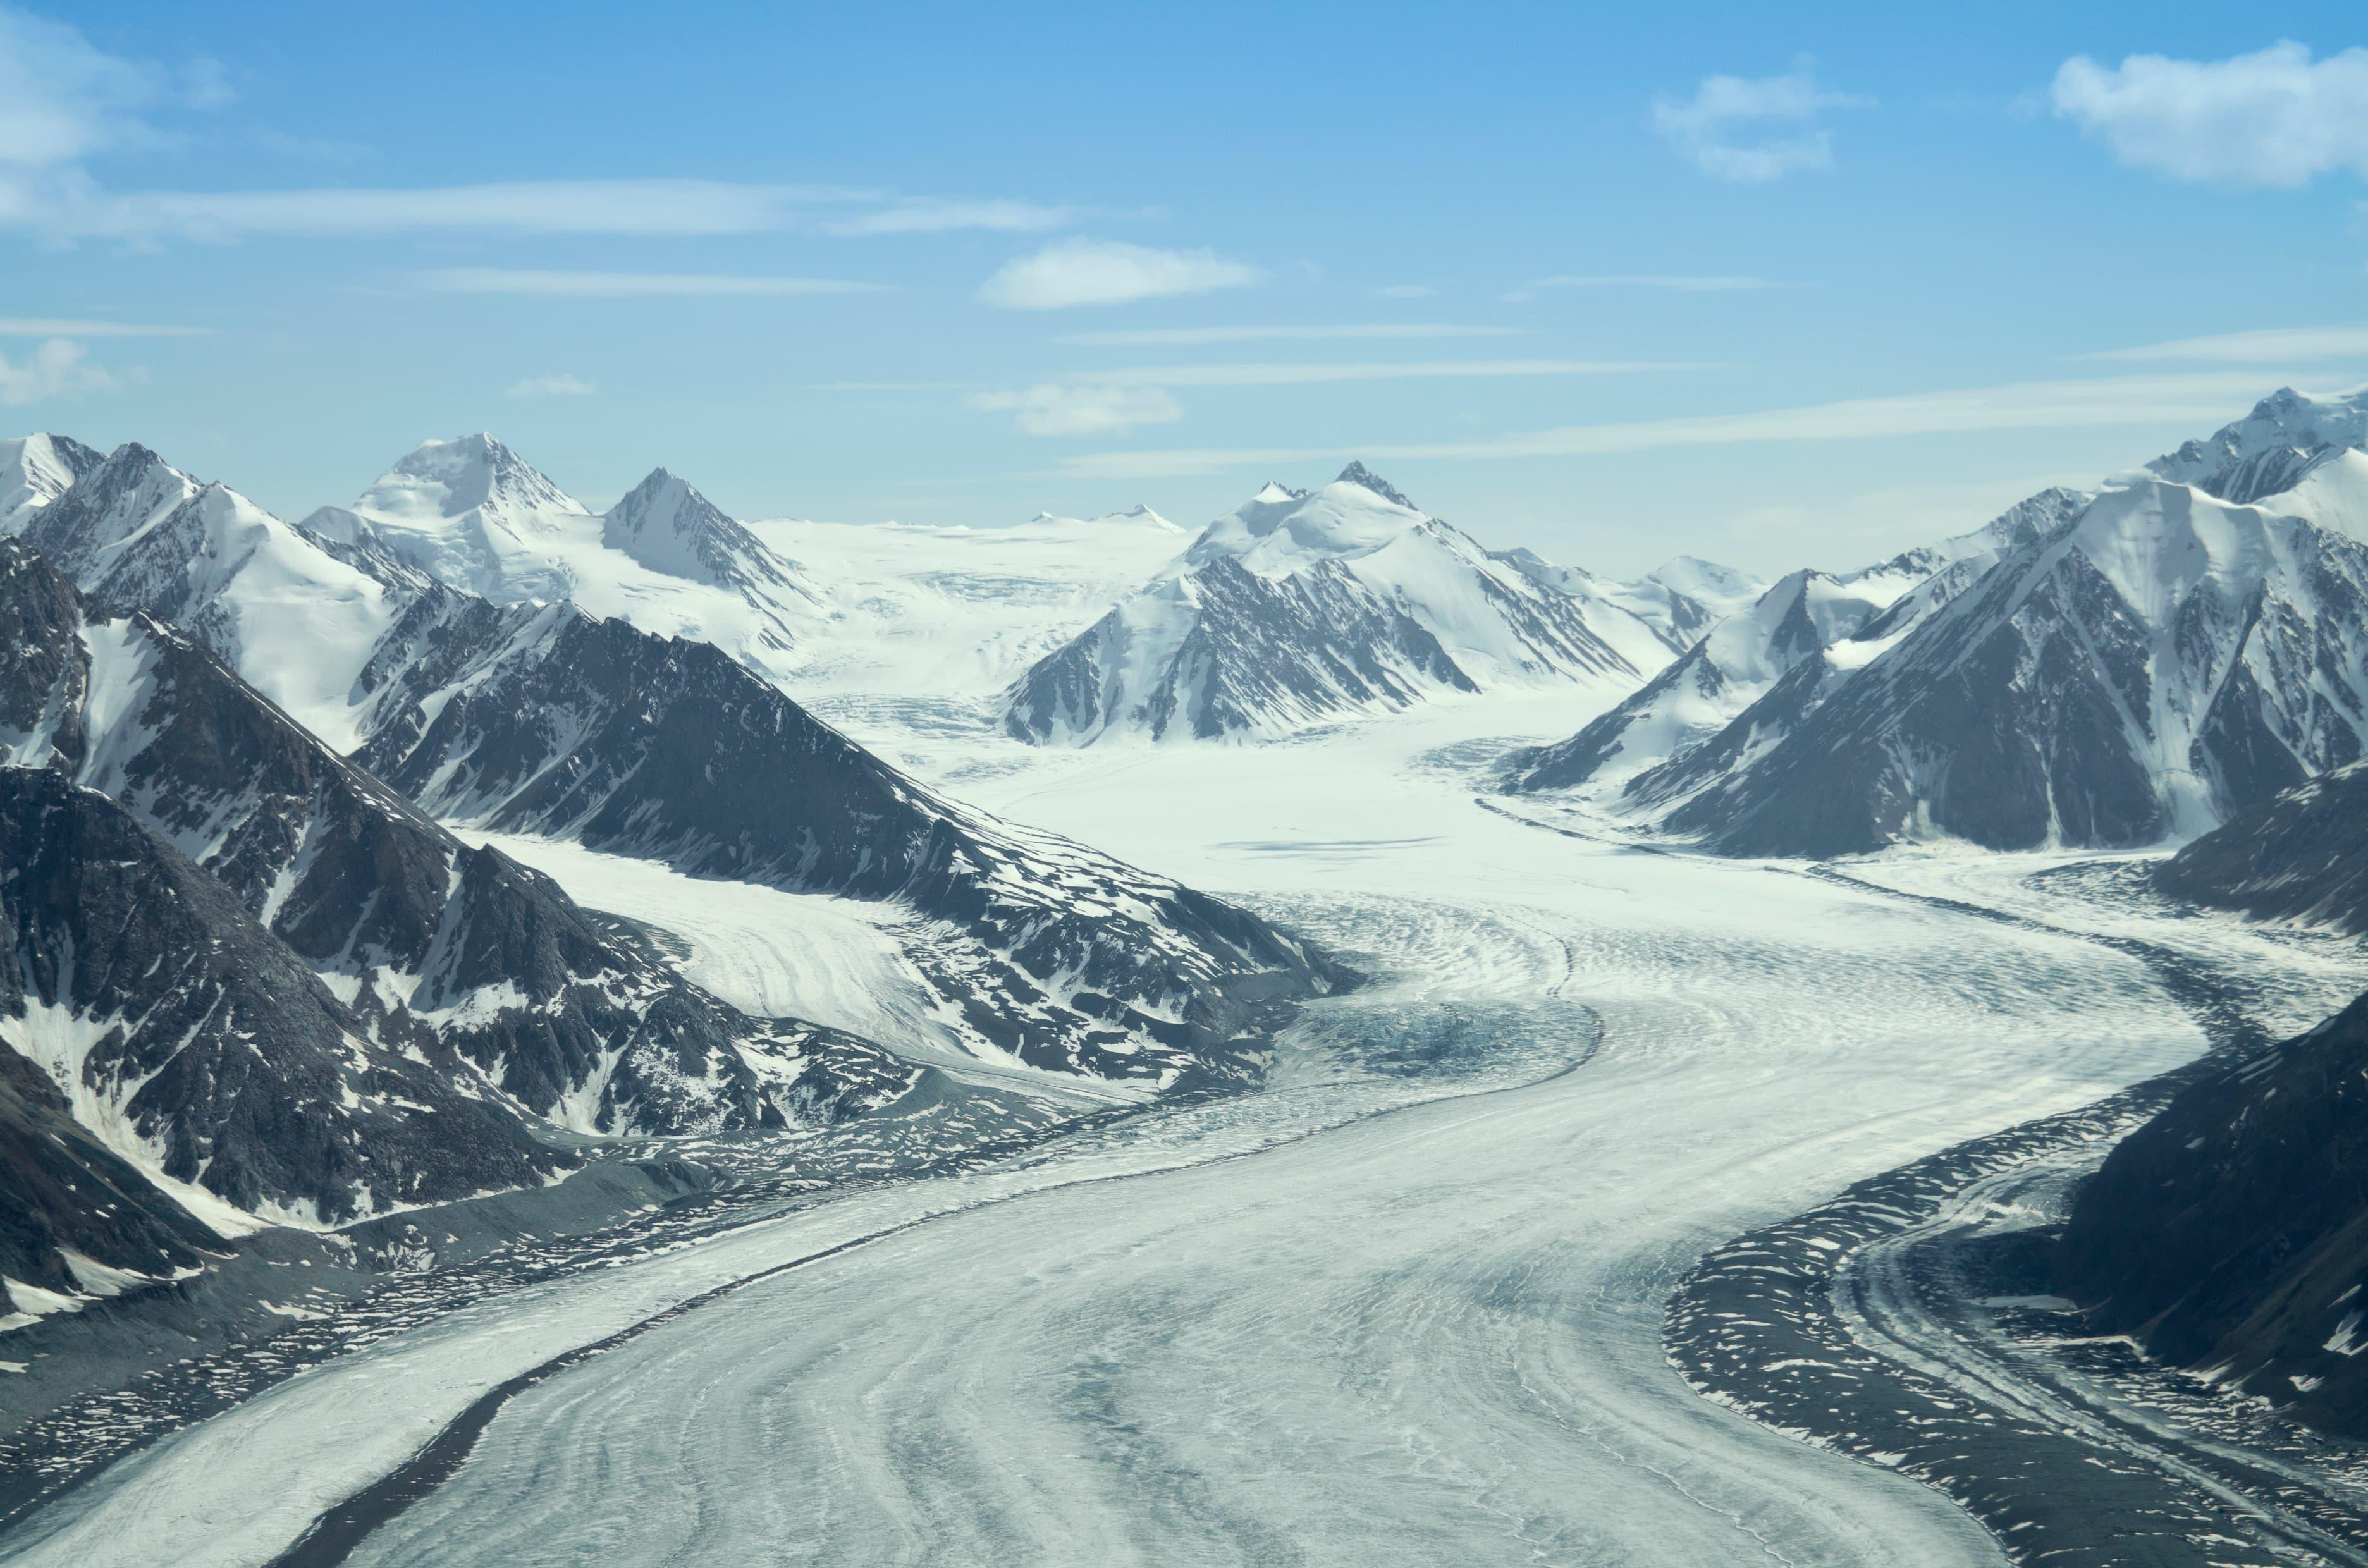 glaciers in the St. Elias range